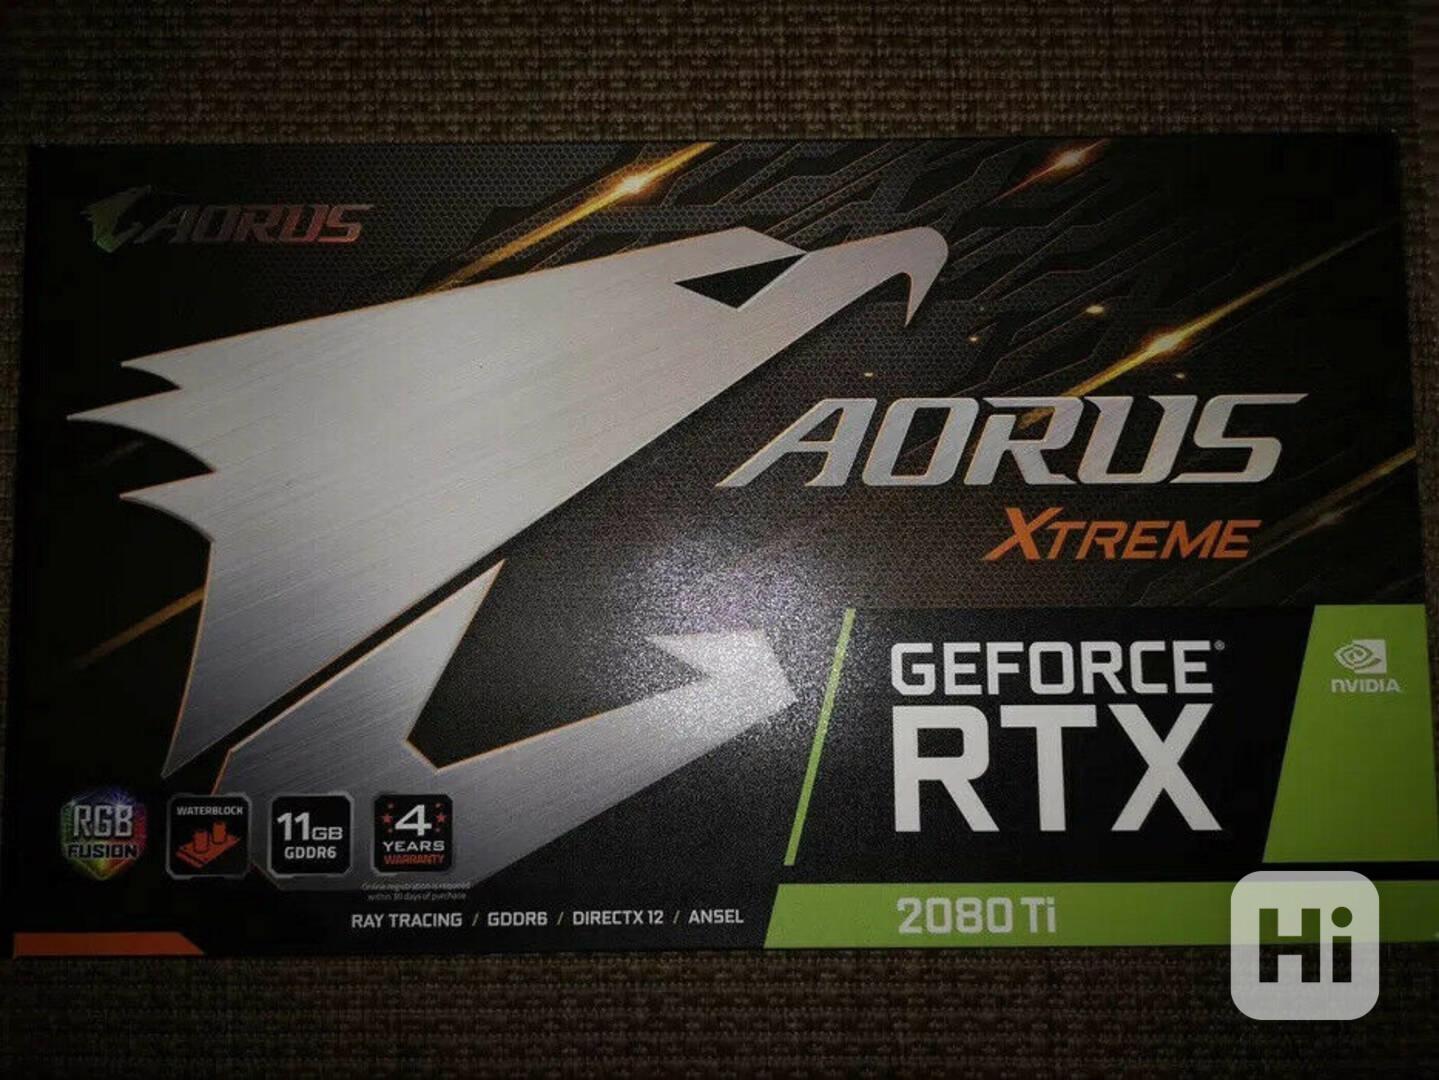 GIGABYTE AORUS NVIDIA GeForce RTX 2080 TI 11 GB GDDR6 XTREME - foto 1